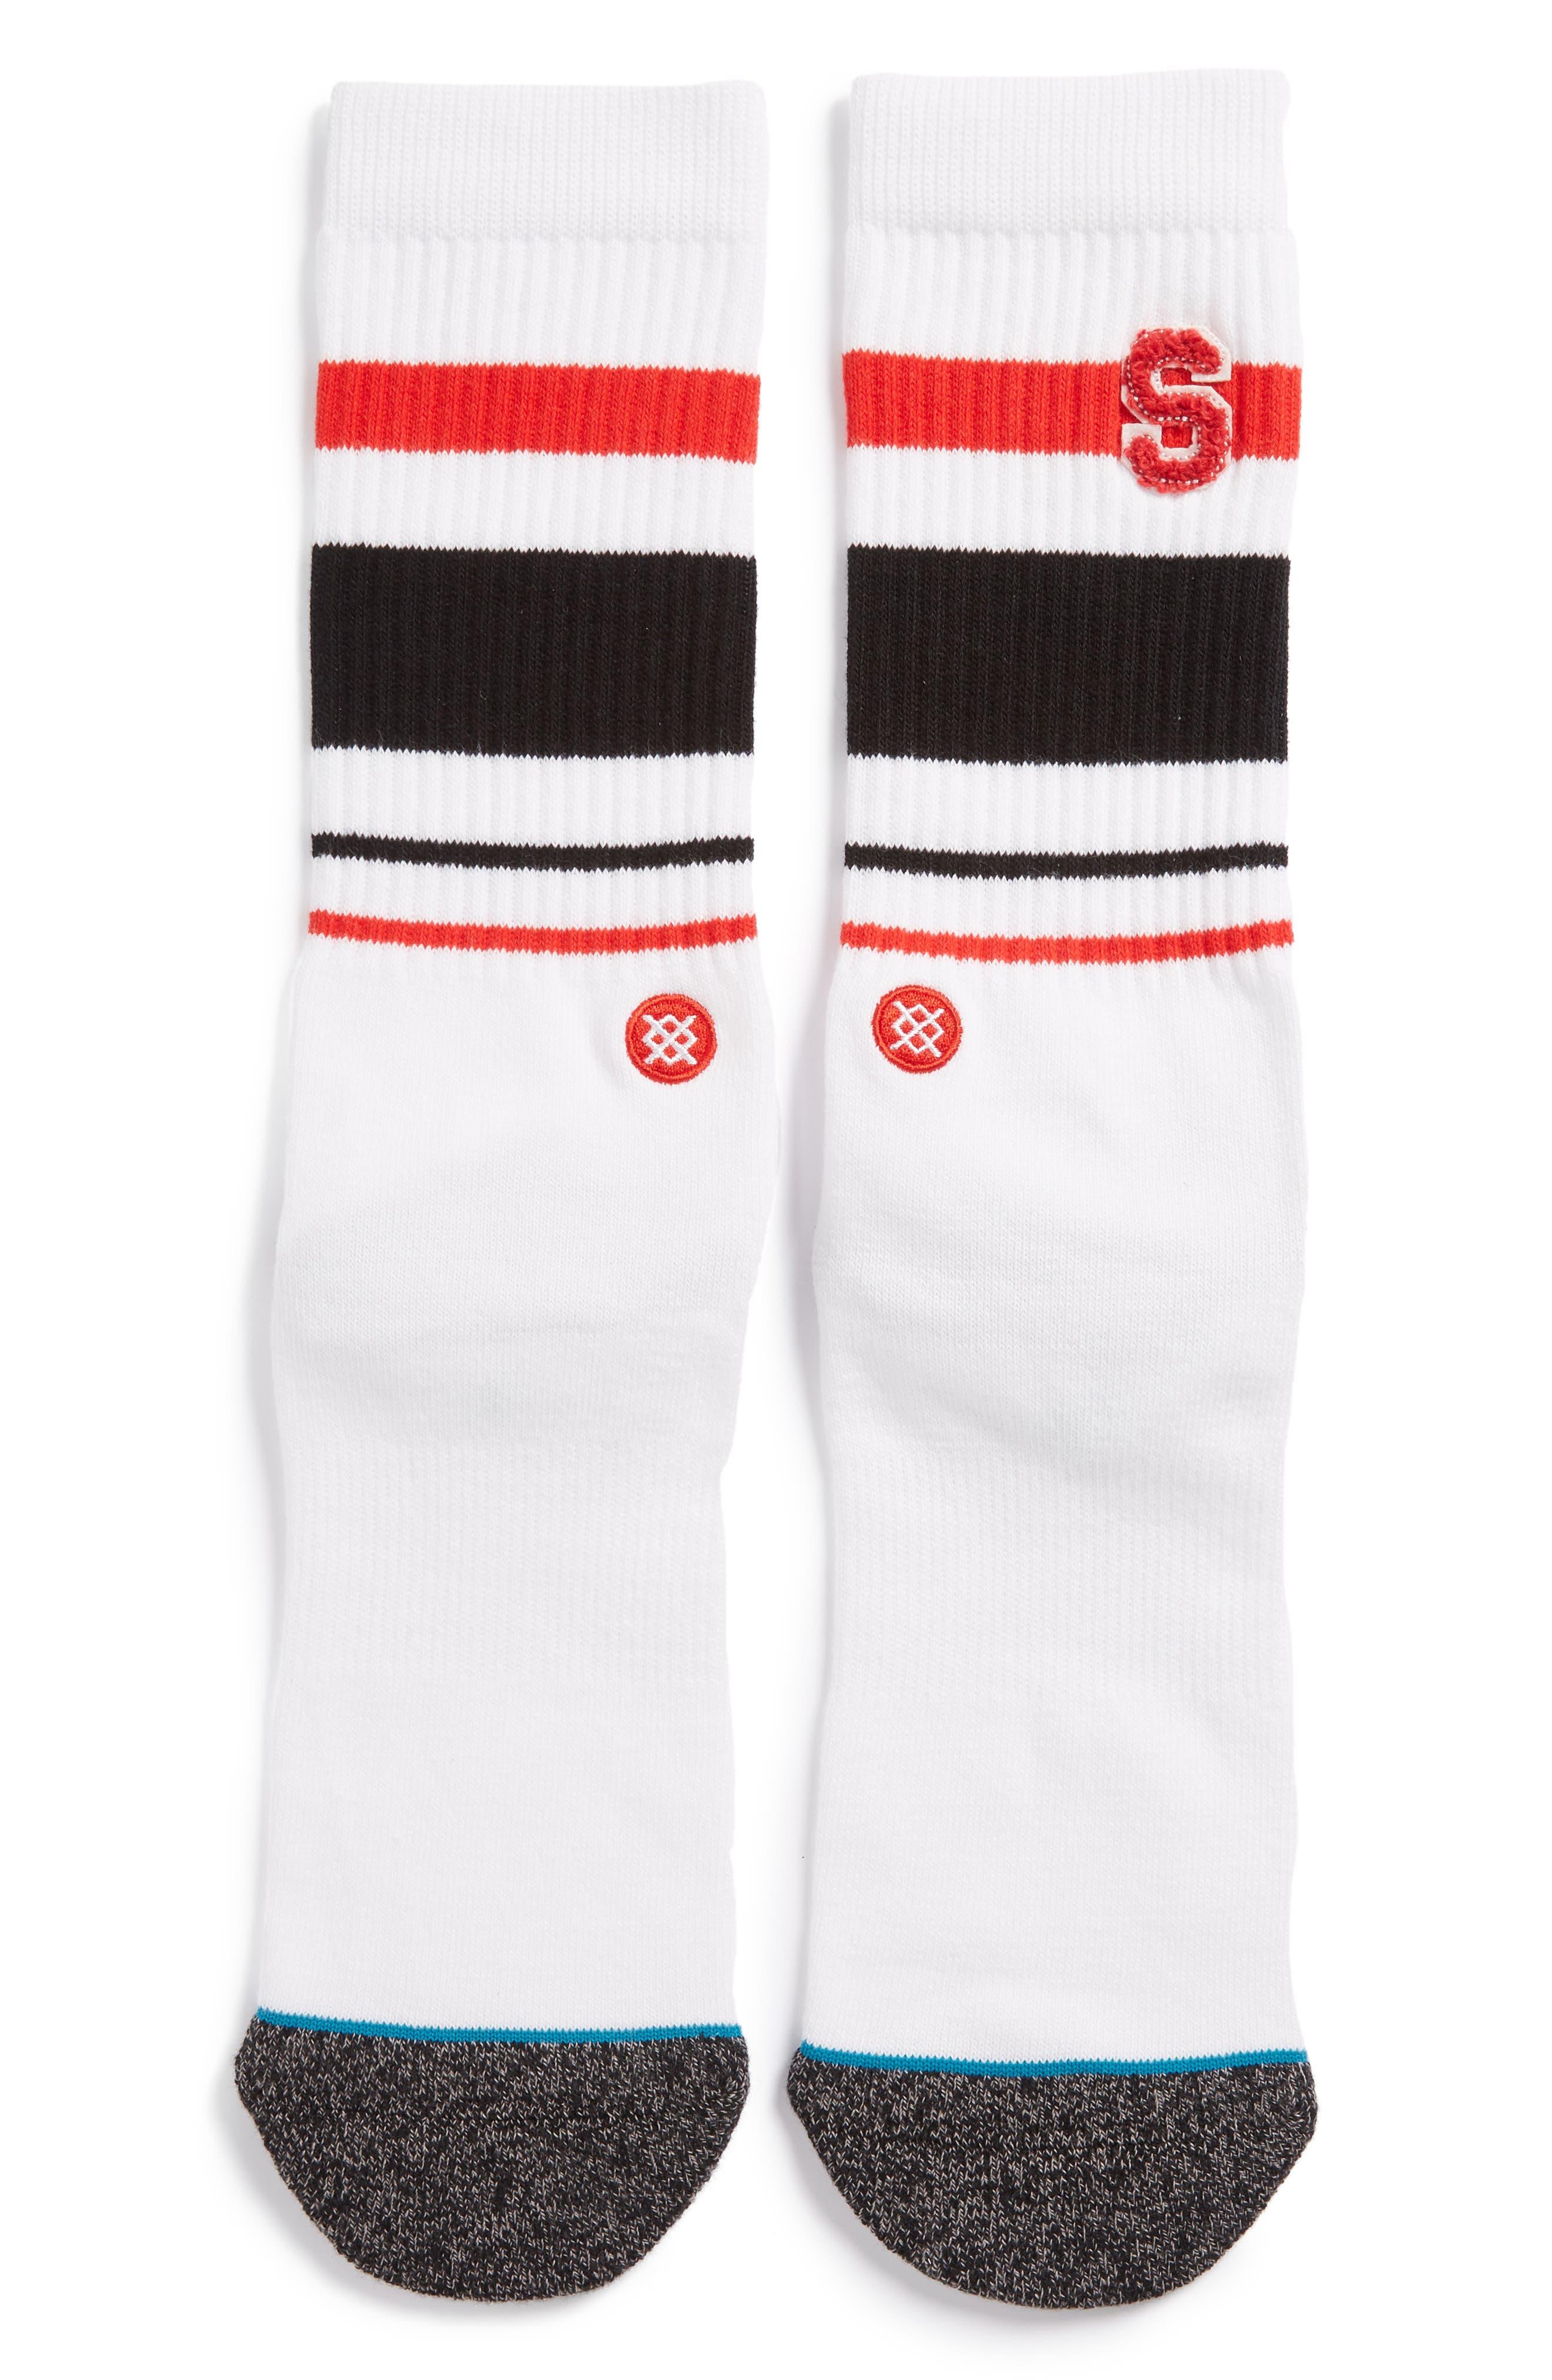 JV Crew Socks,                             Main thumbnail 1, color,                             100